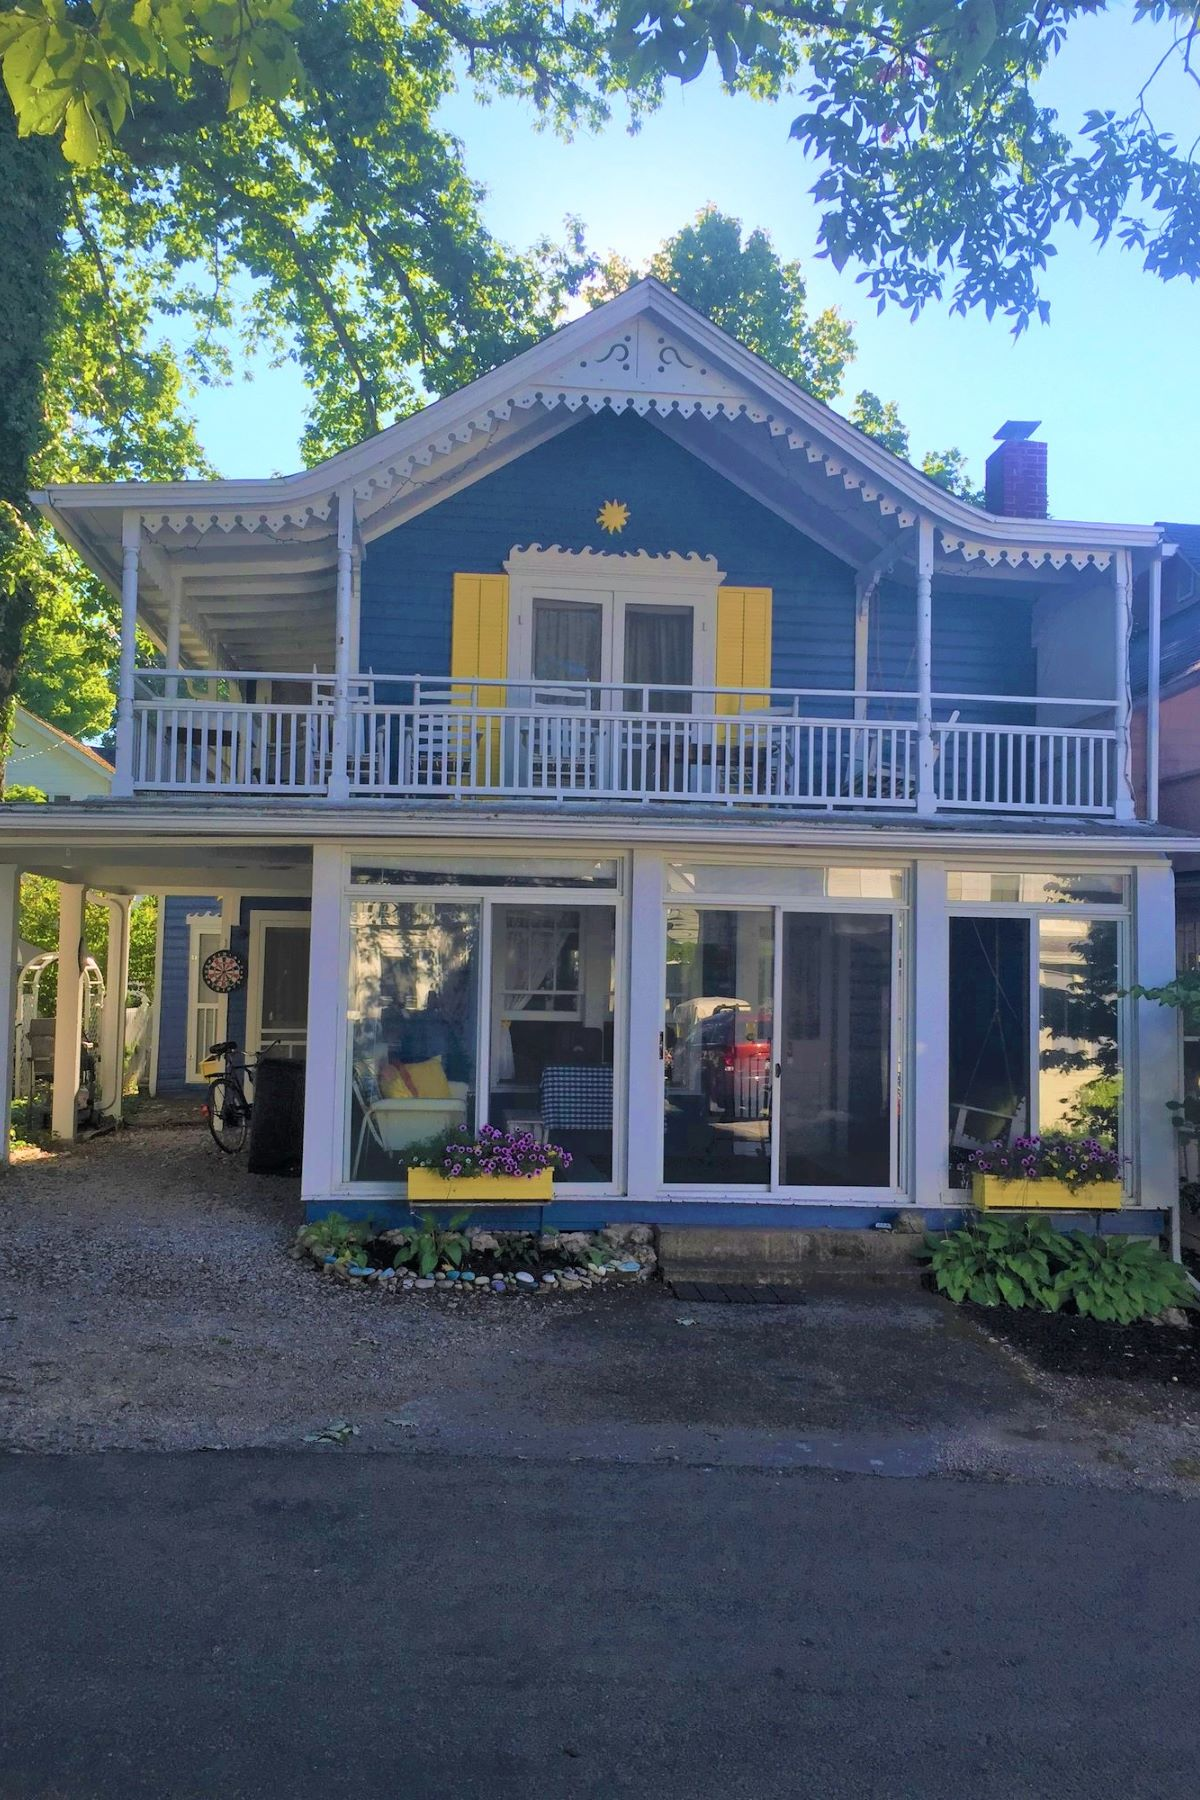 Single Family Home for Sale at 222 Sycamore Avenue 222 Sycamore Avenue Lakeside, Ohio 43440 United States